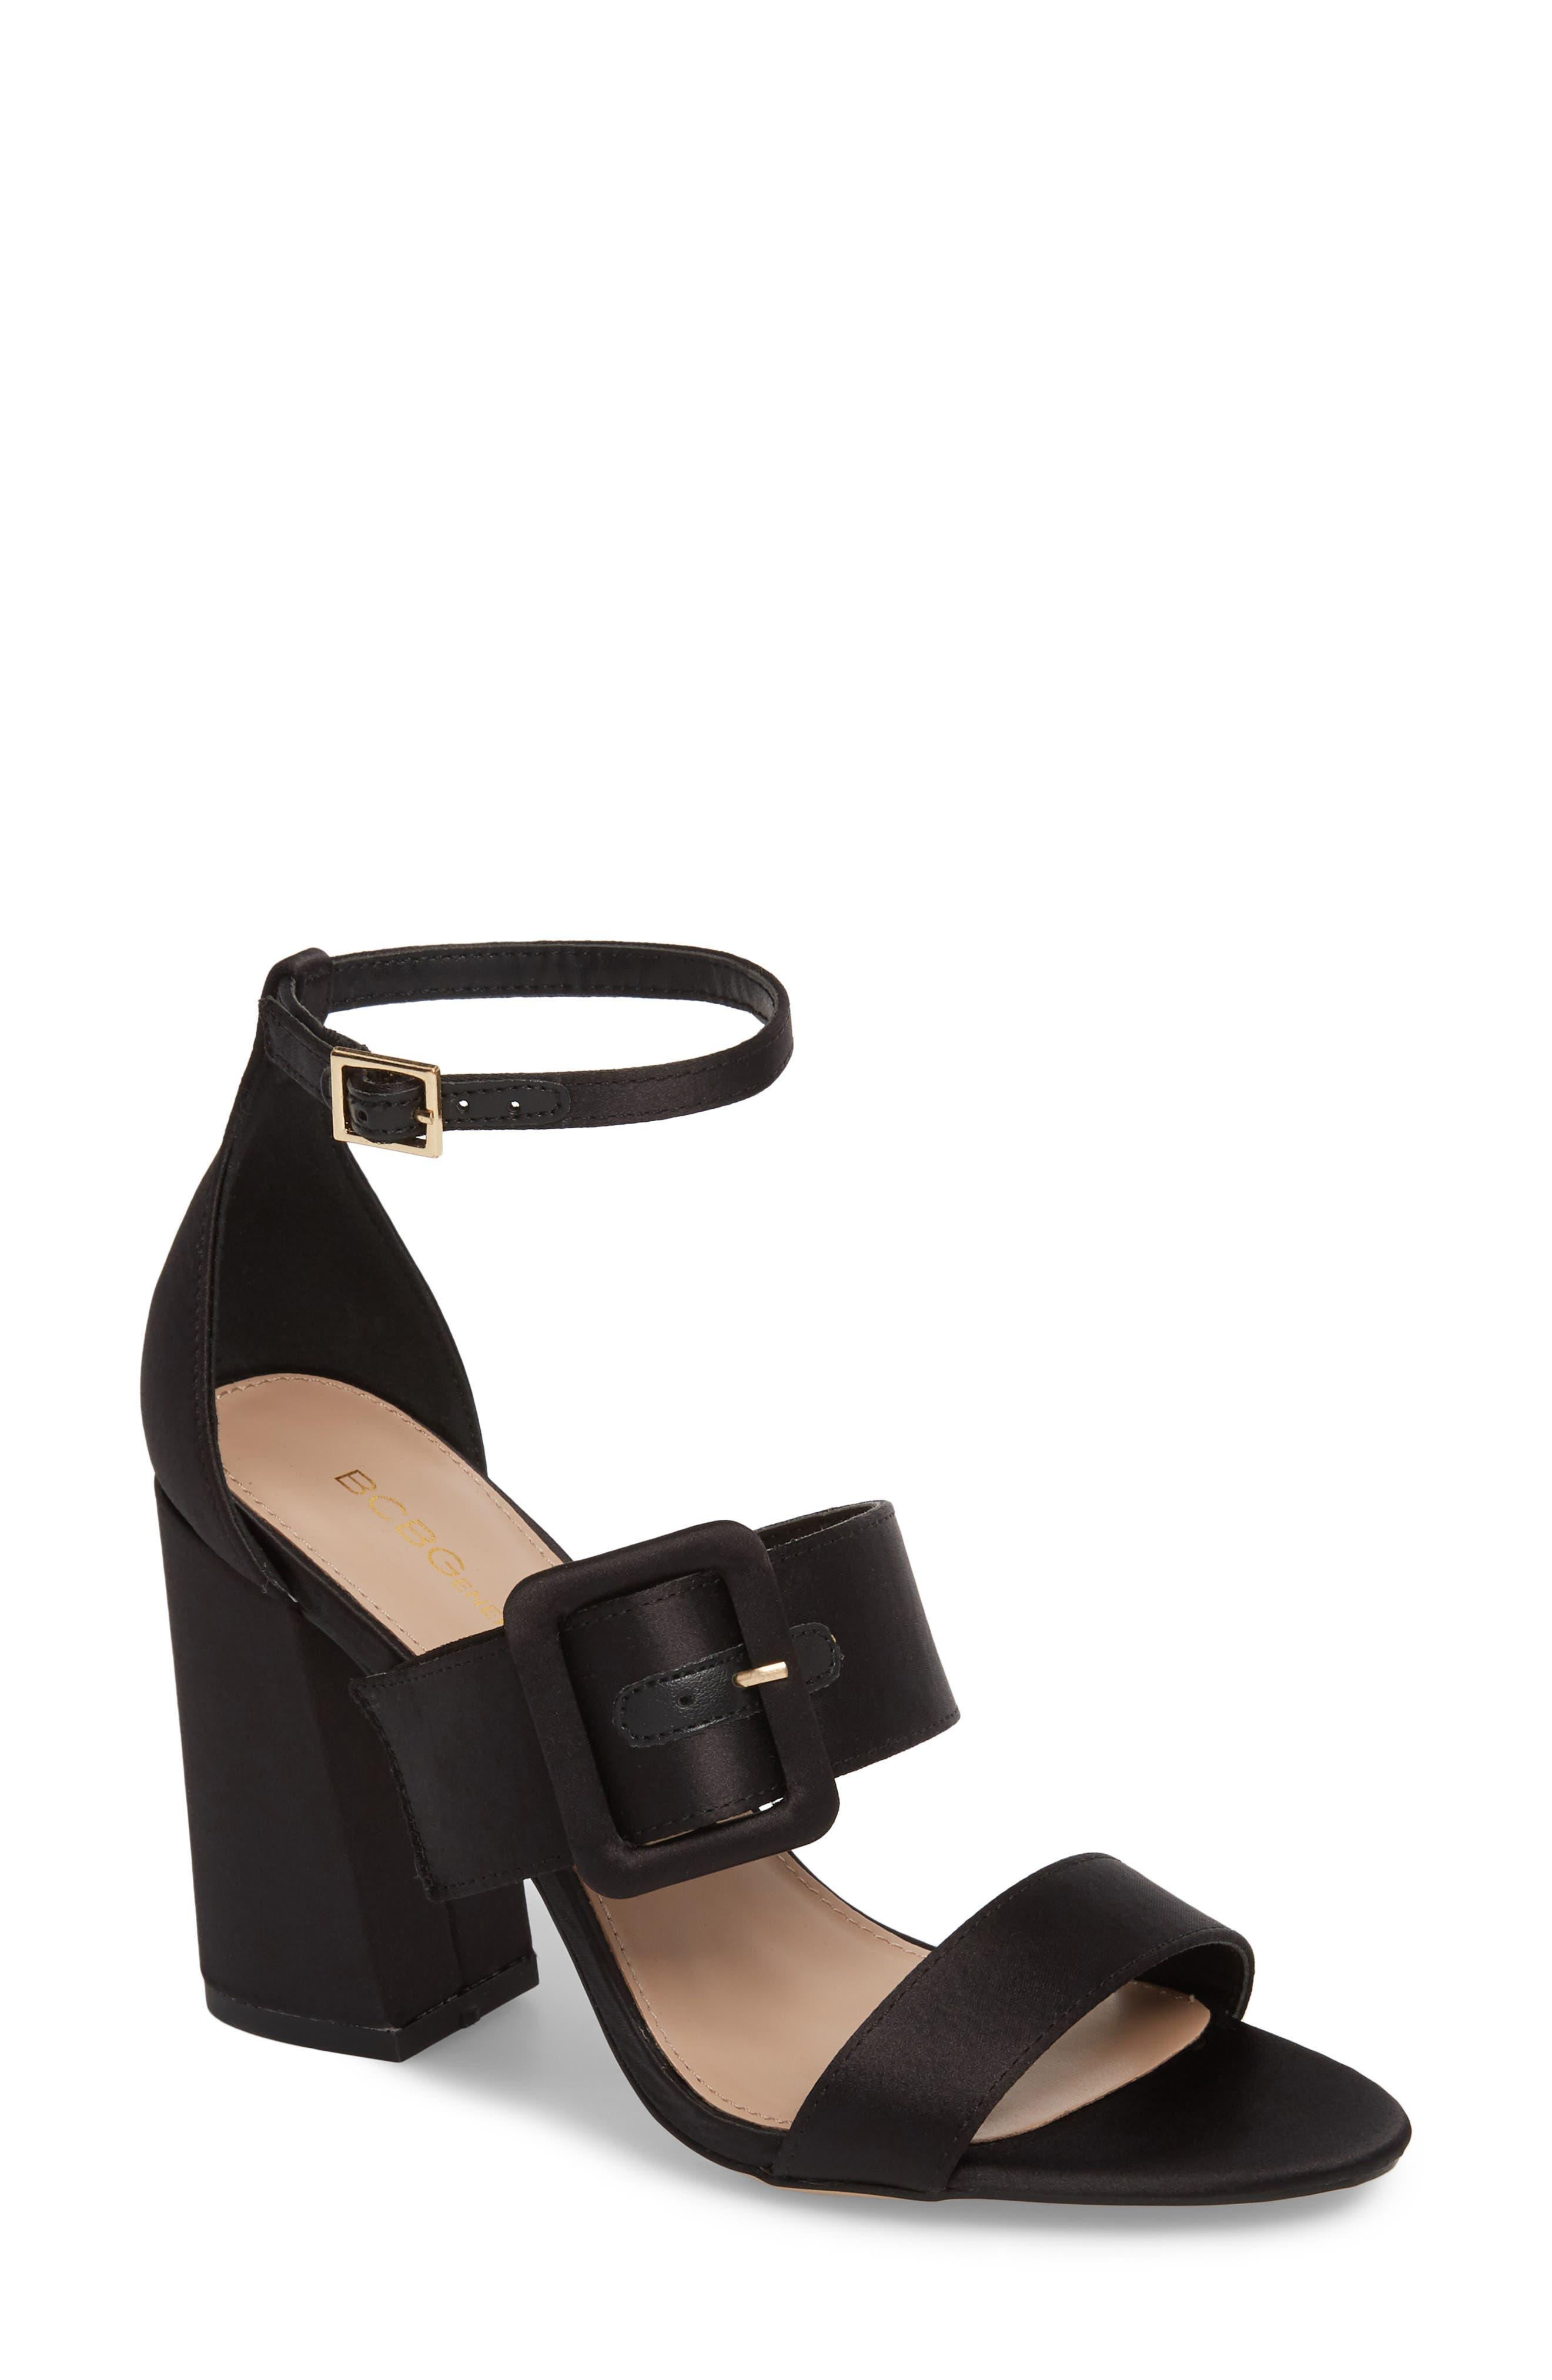 Raelynn Ankle Strap Sandal,                             Main thumbnail 1, color,                             BLACK SATIN